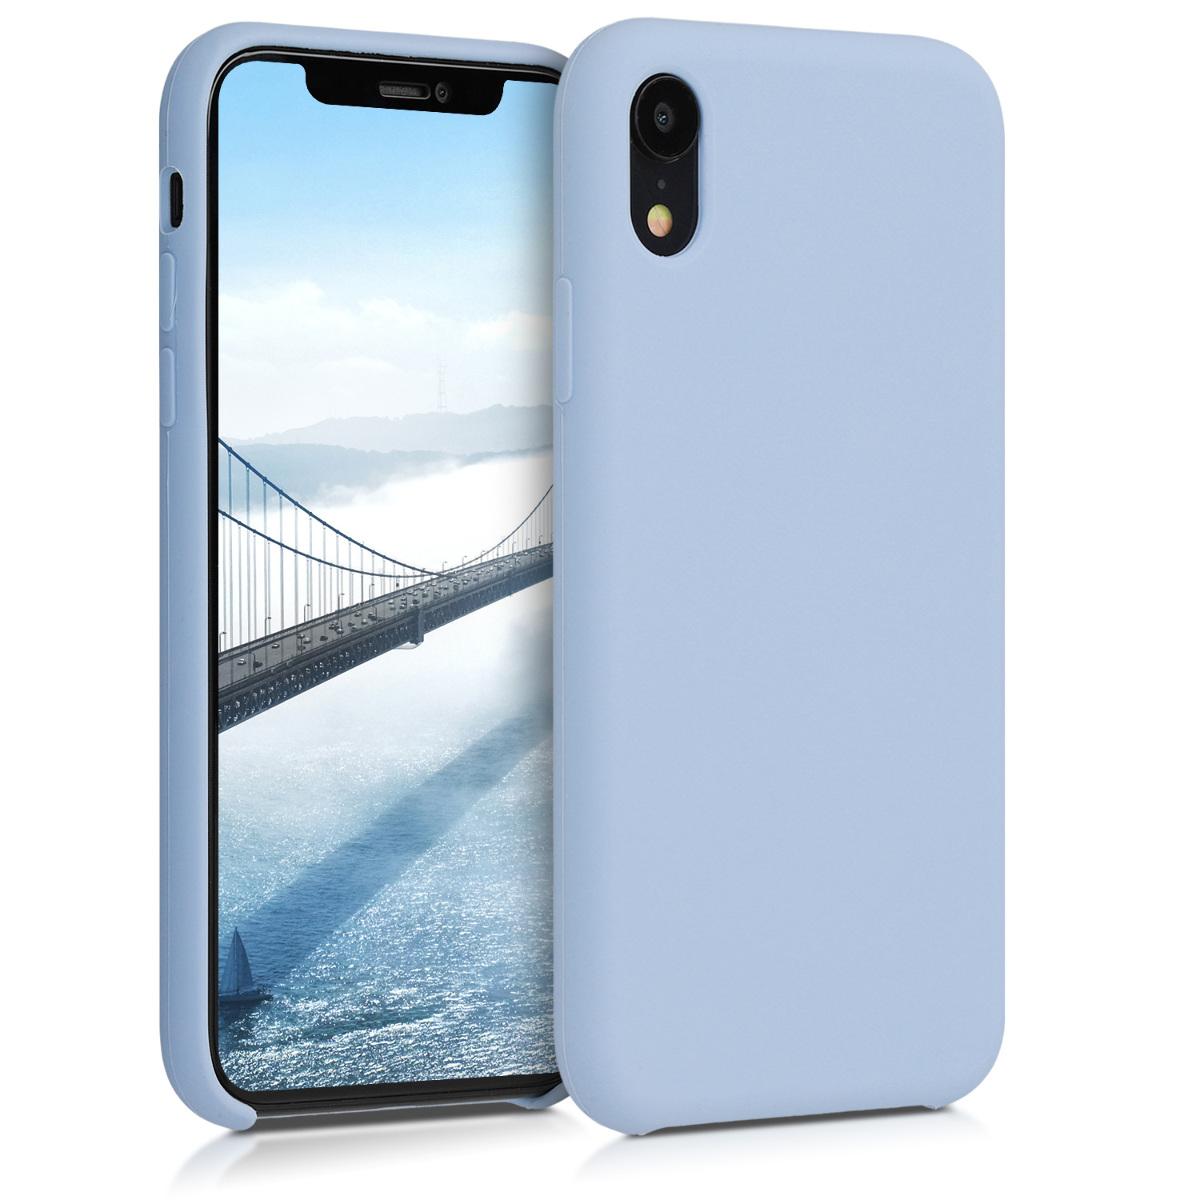 KW TPU Θήκη Σιλικόνης Apple iPhone XR - Soft Flexible Rubber Protective Cover - Light Blue Matte (45910.58)